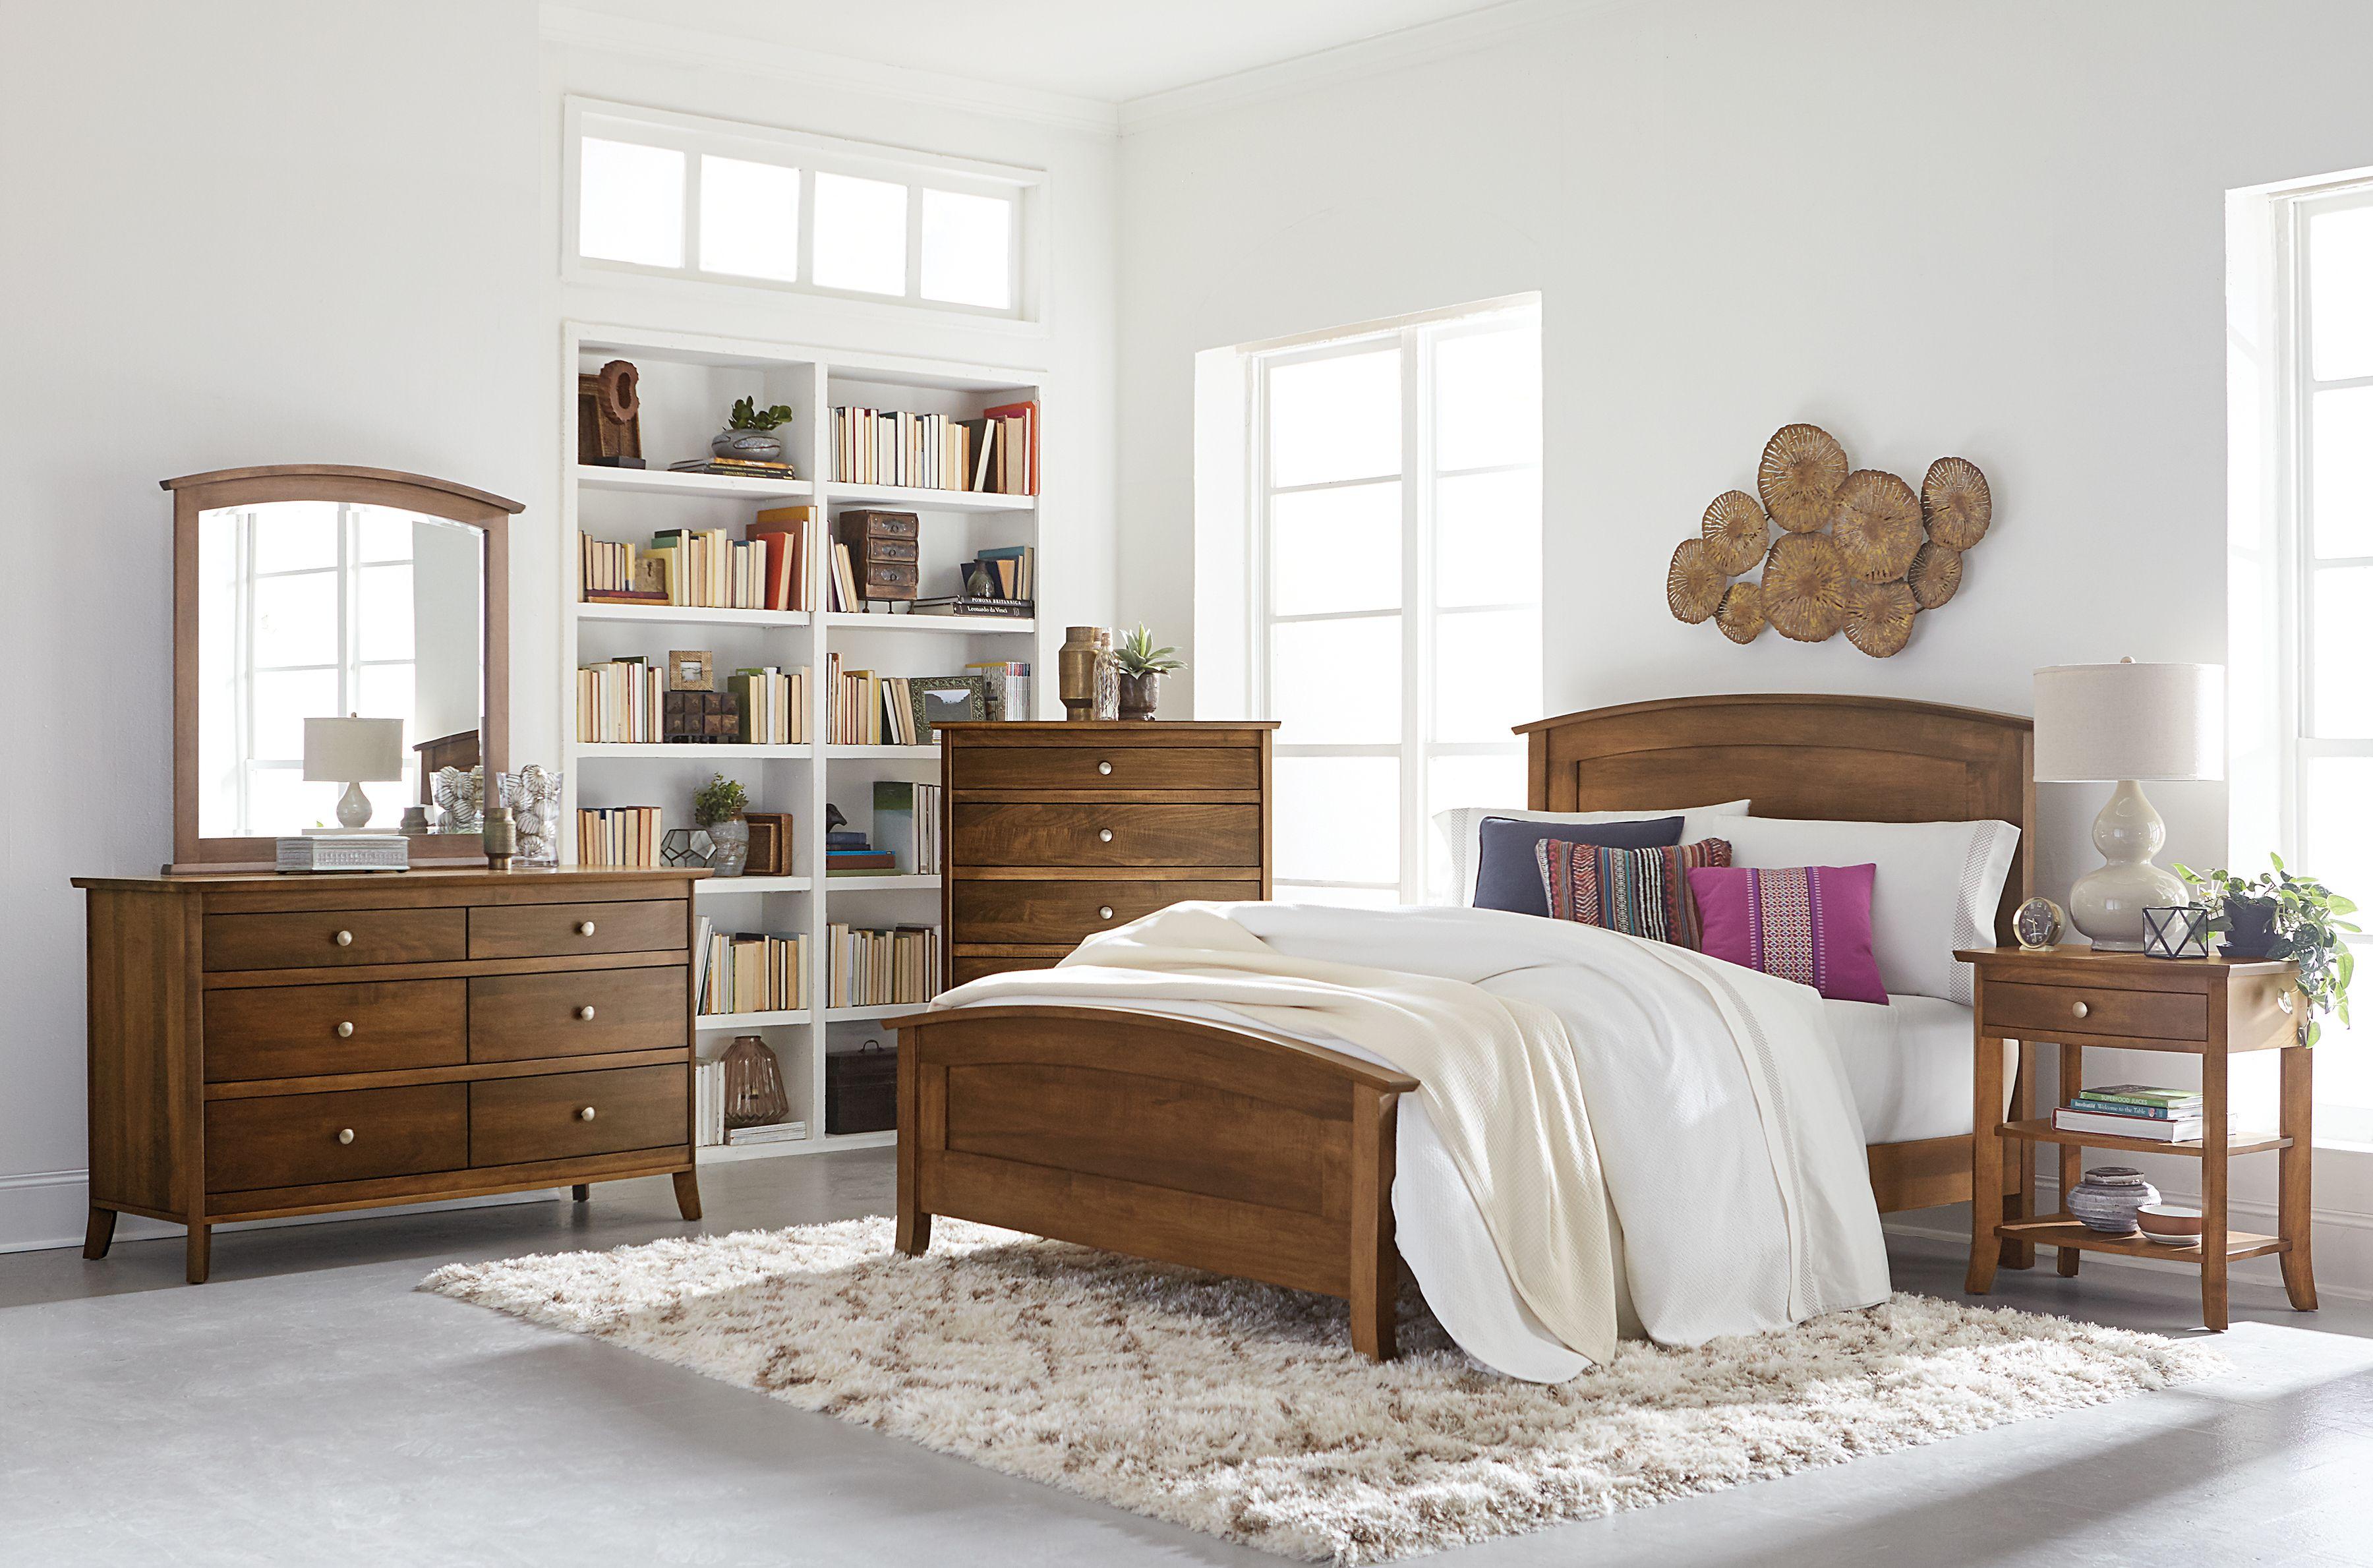 Laurel Bed Furniture, Amish furniture, Solid wood